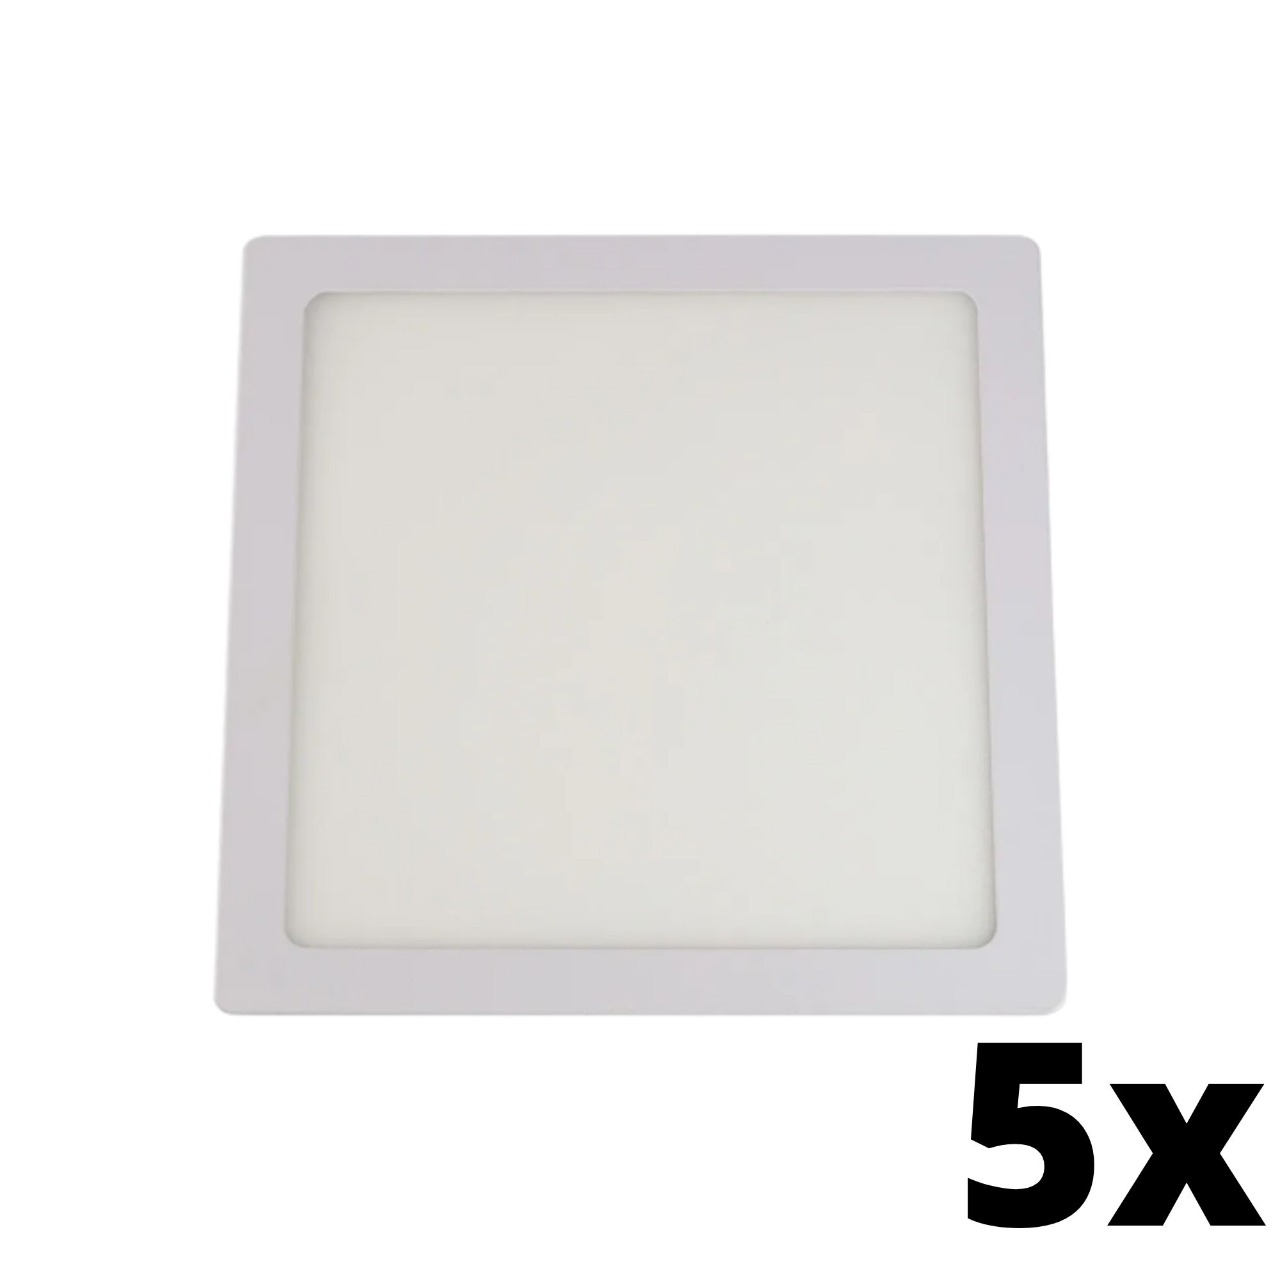 Kit 5 und Painel de Led Embutir 24w Quadrado 6500k